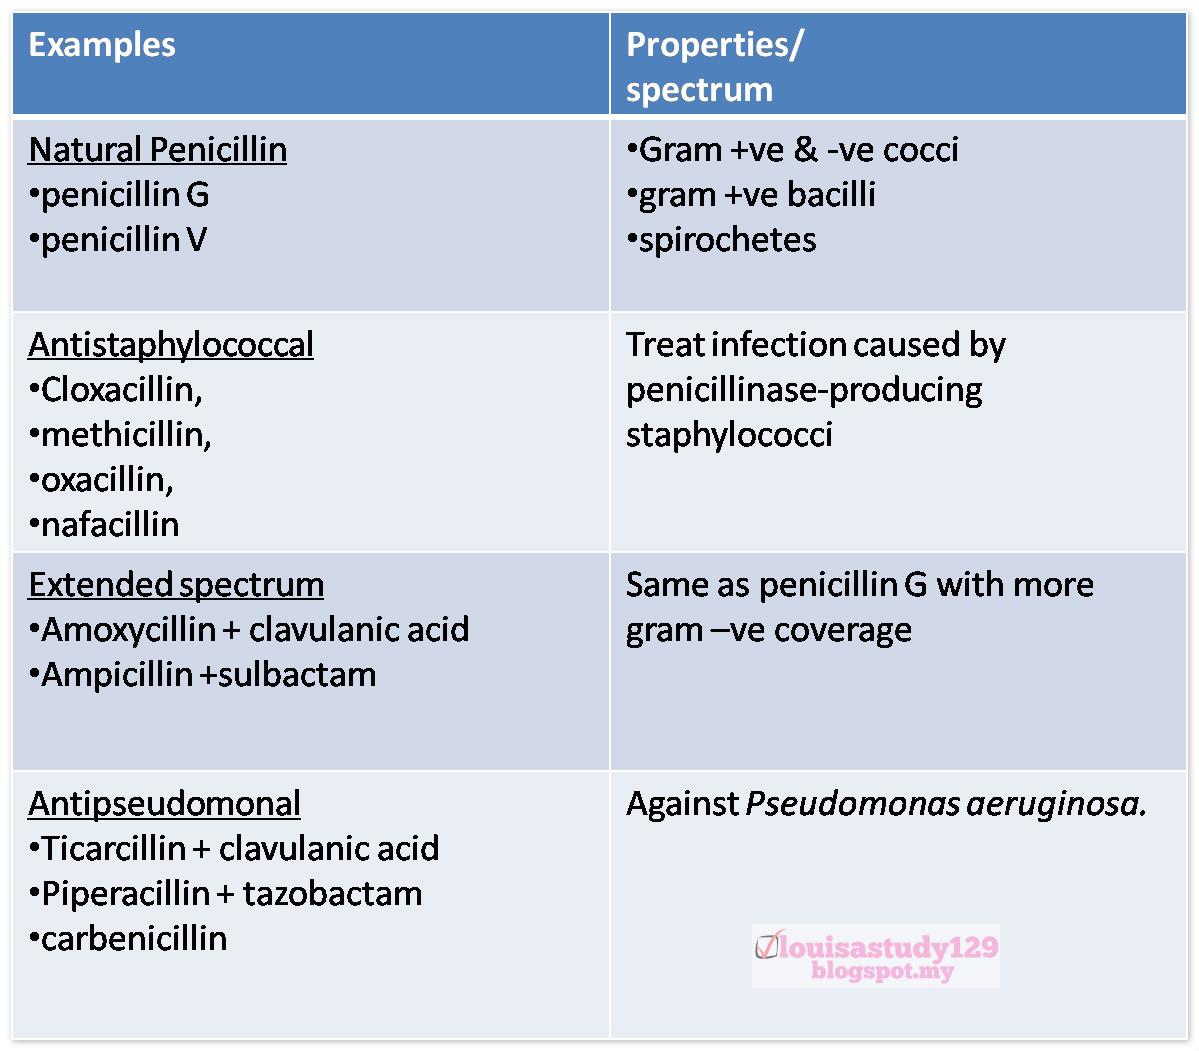 Groups of antibiotics and side effects of antibiotics